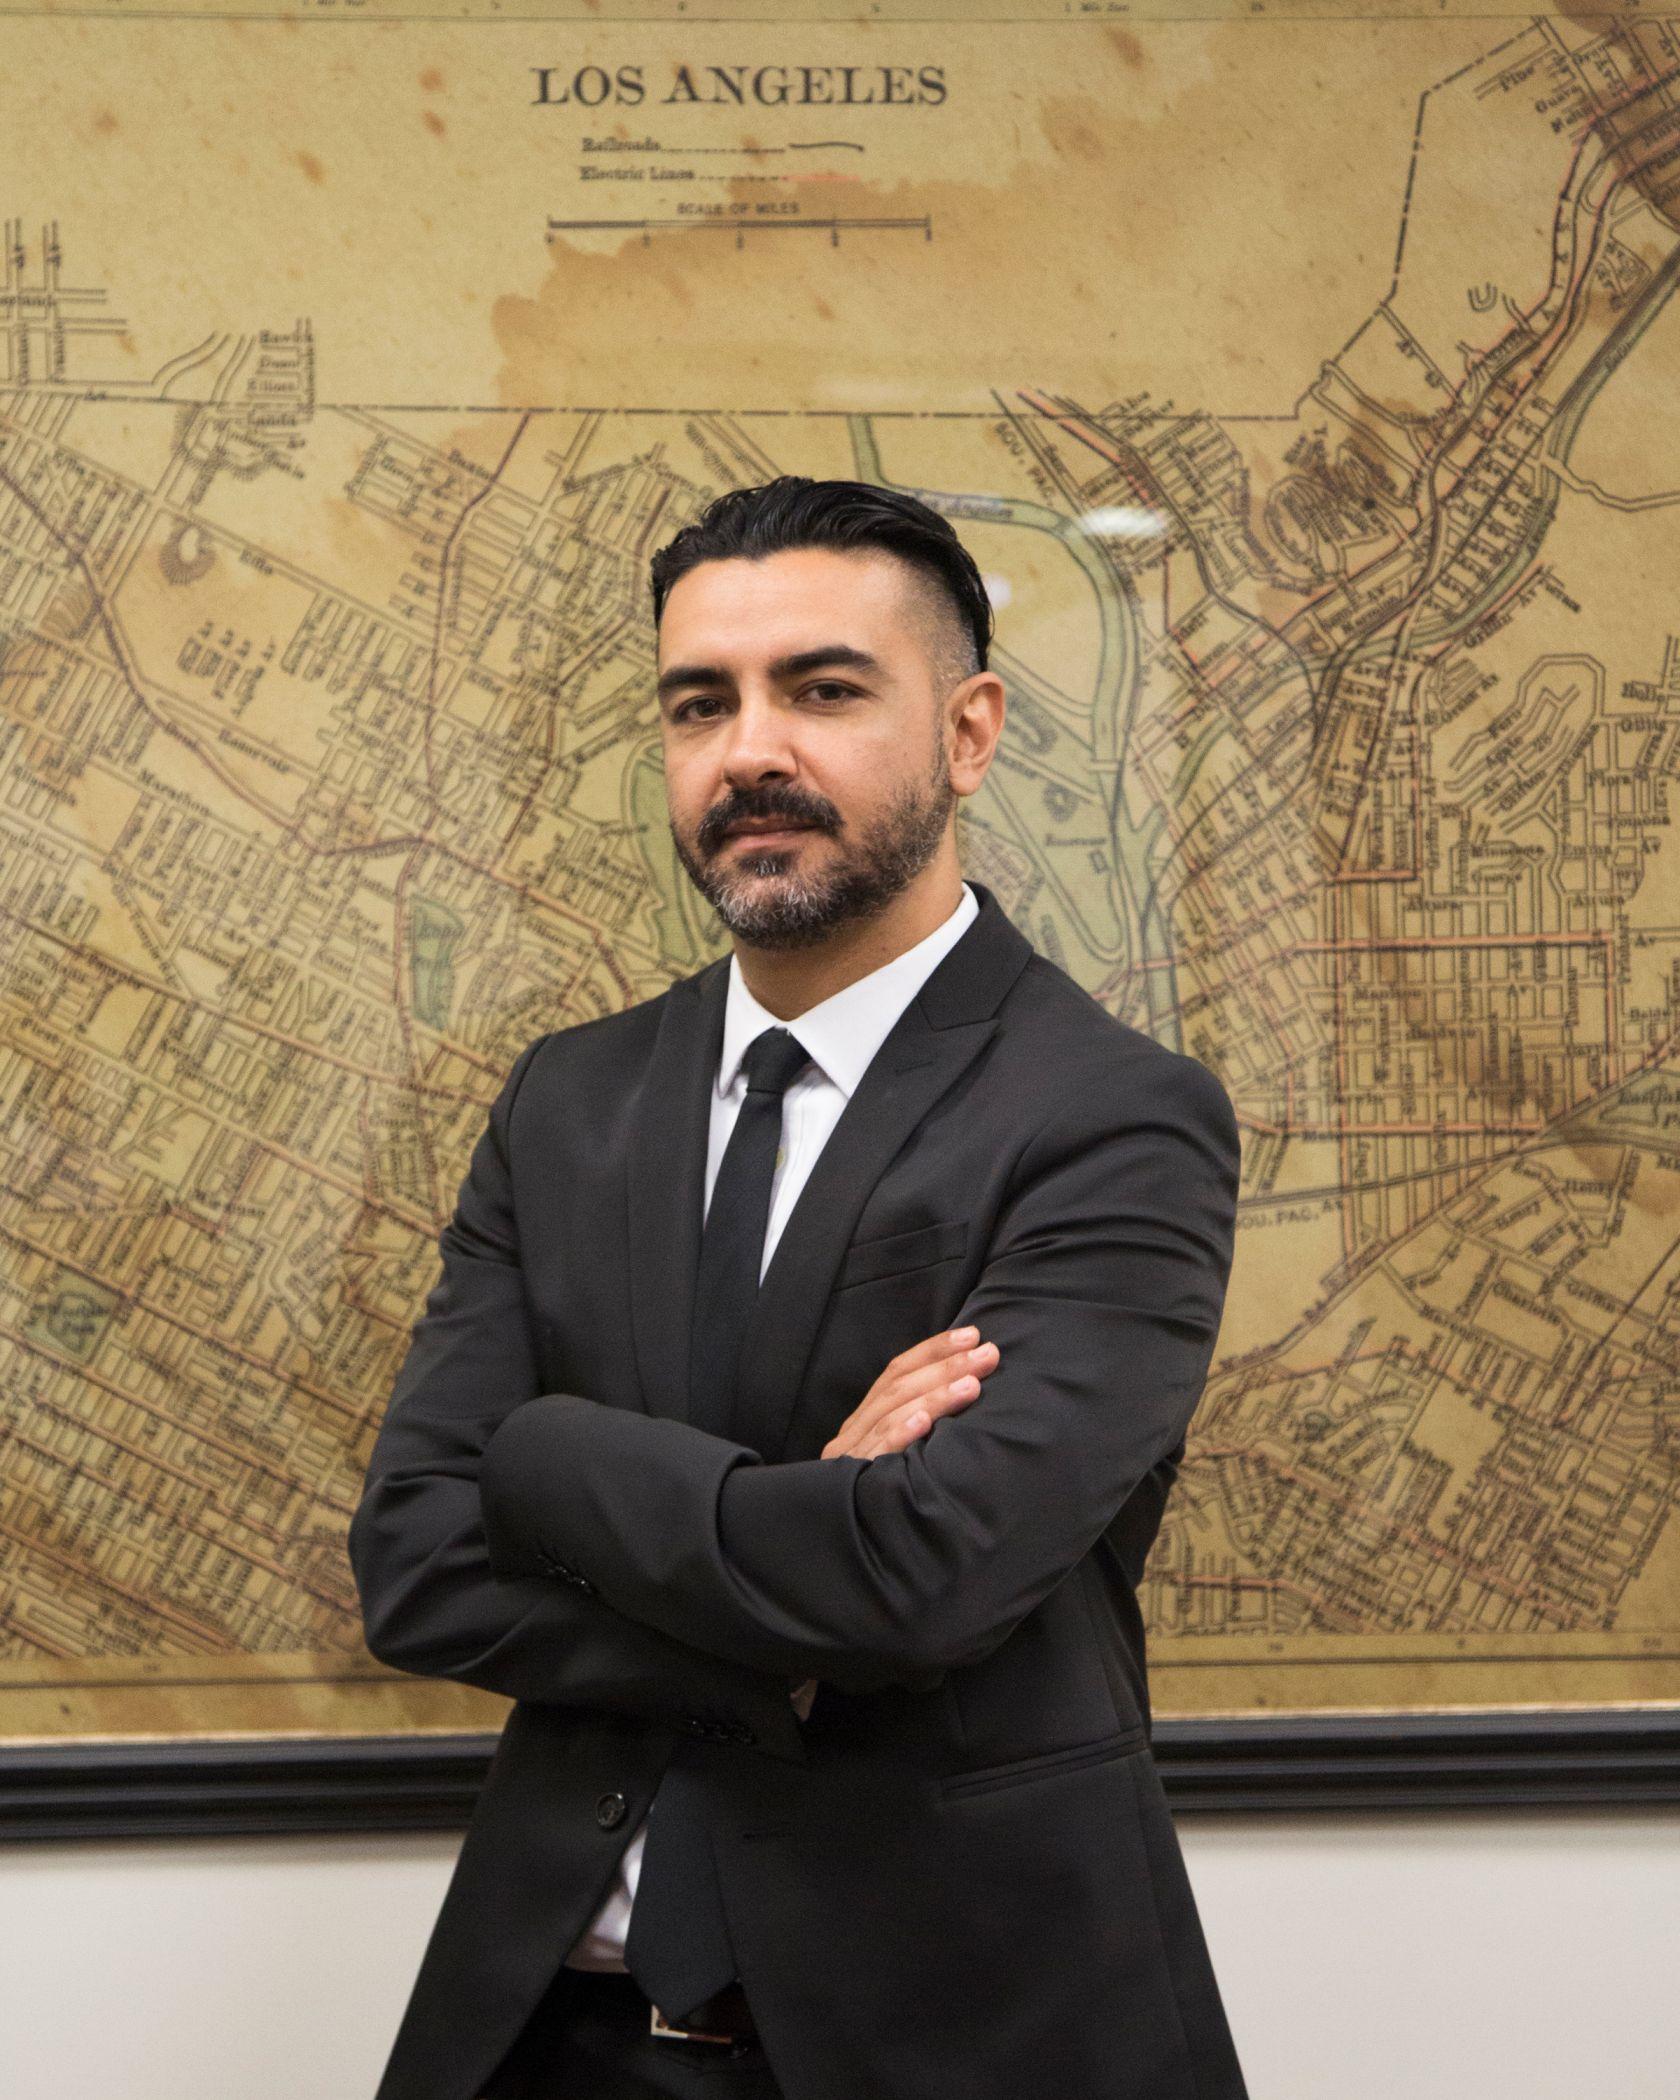 Founding Partner of the H Law Group Nima Haddadi